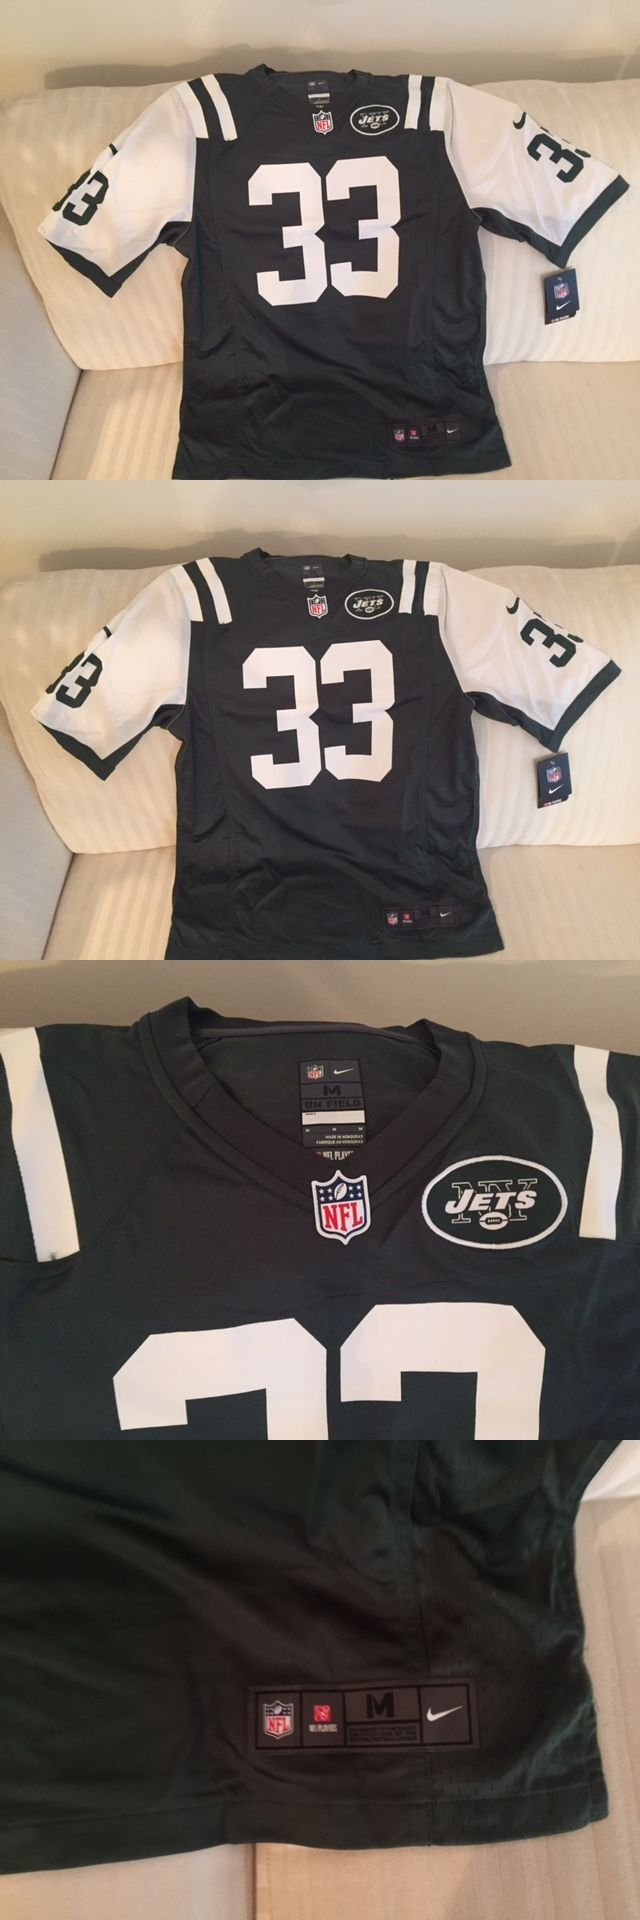 Football-NFL 206: Nwt Men S Medium Nike On Field Jersey New York Jets 33 Jamal Adams -> BUY IT NOW ONLY: $50 on eBay!